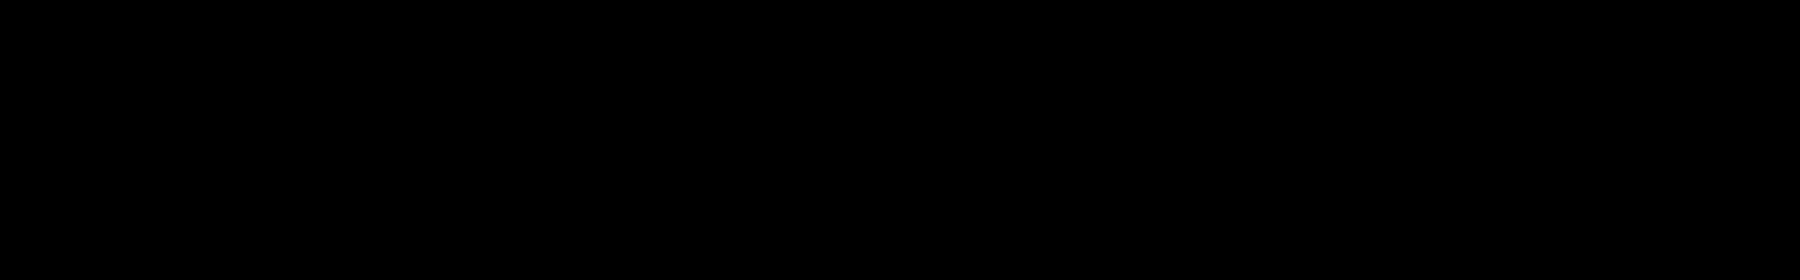 Gunplay audio waveform